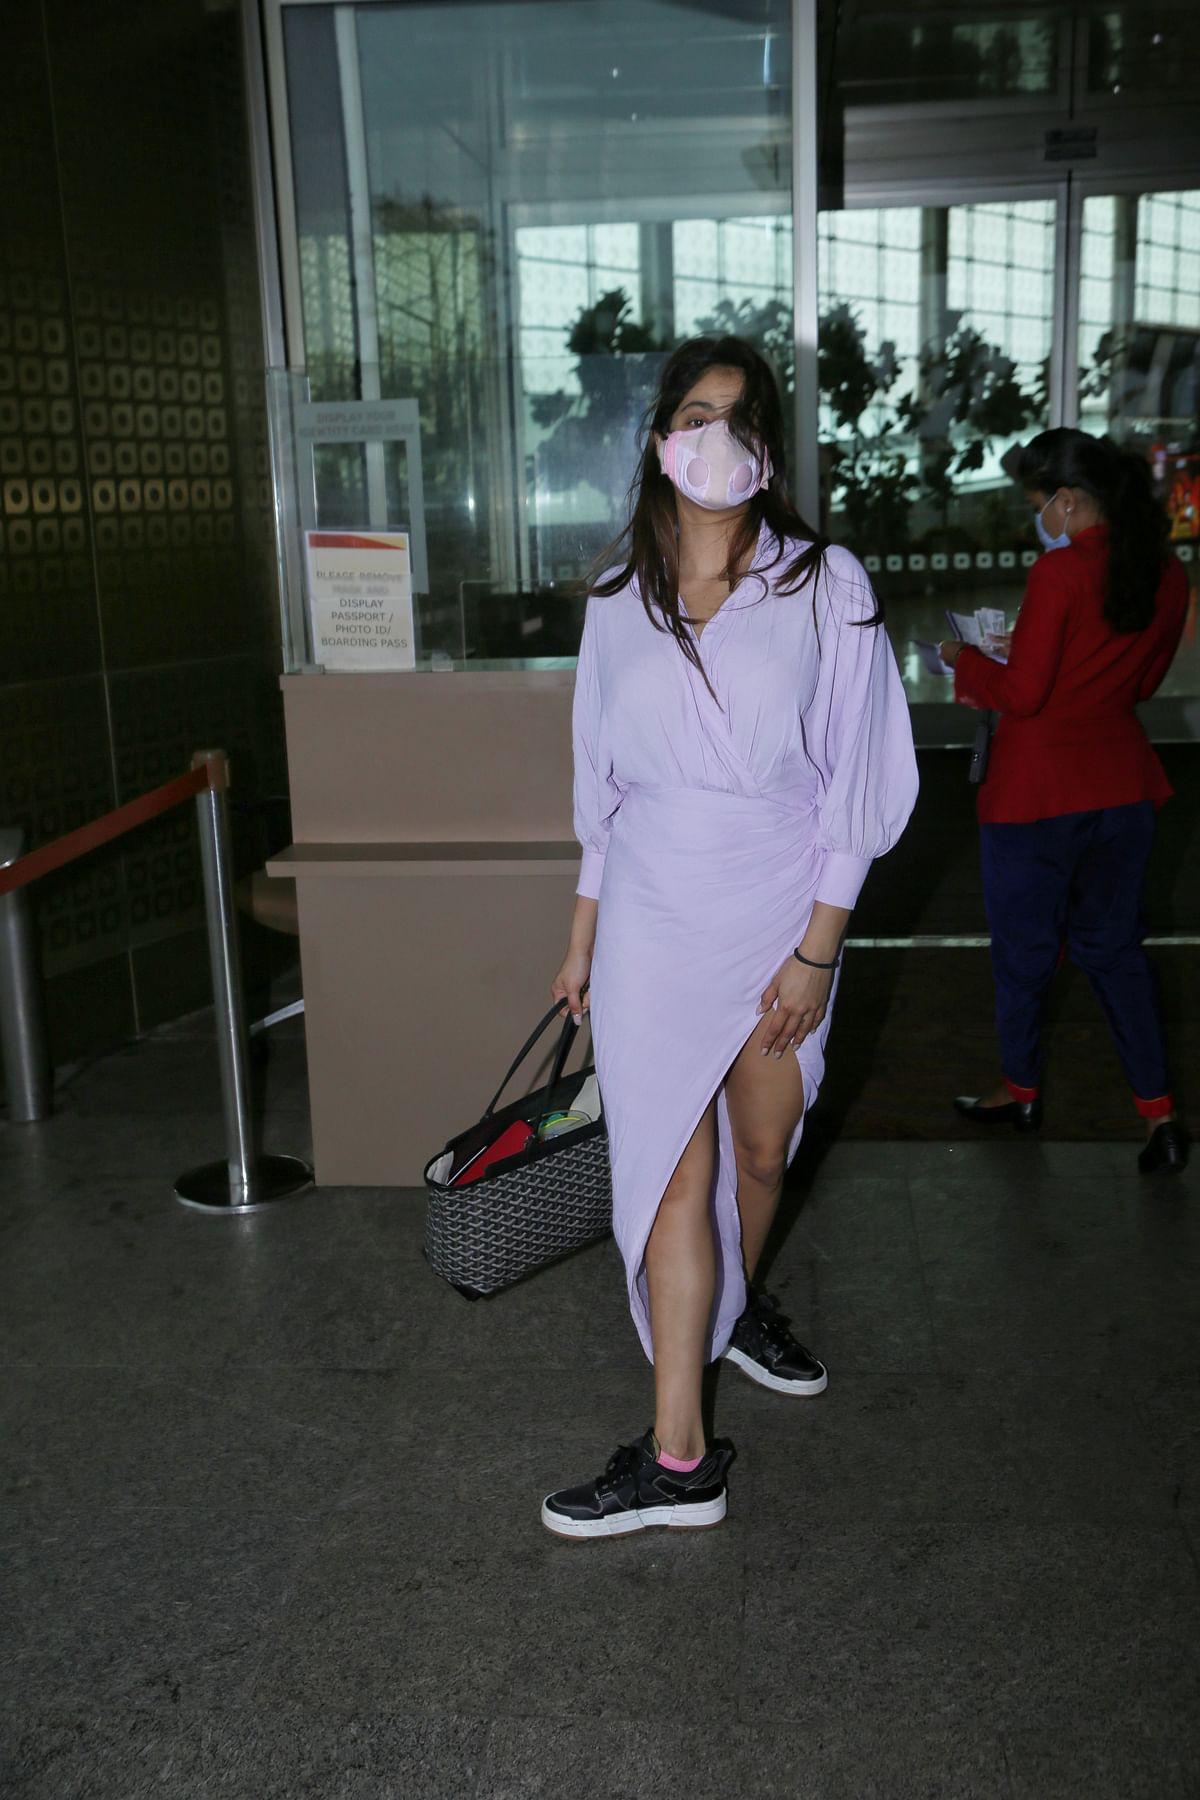 In Pics: Jacqueline Fernandez sashays at Mumbai airport in figure-hugging Fendi dress; Janhvi Kapoor opts for thigh-high slit lilac dress